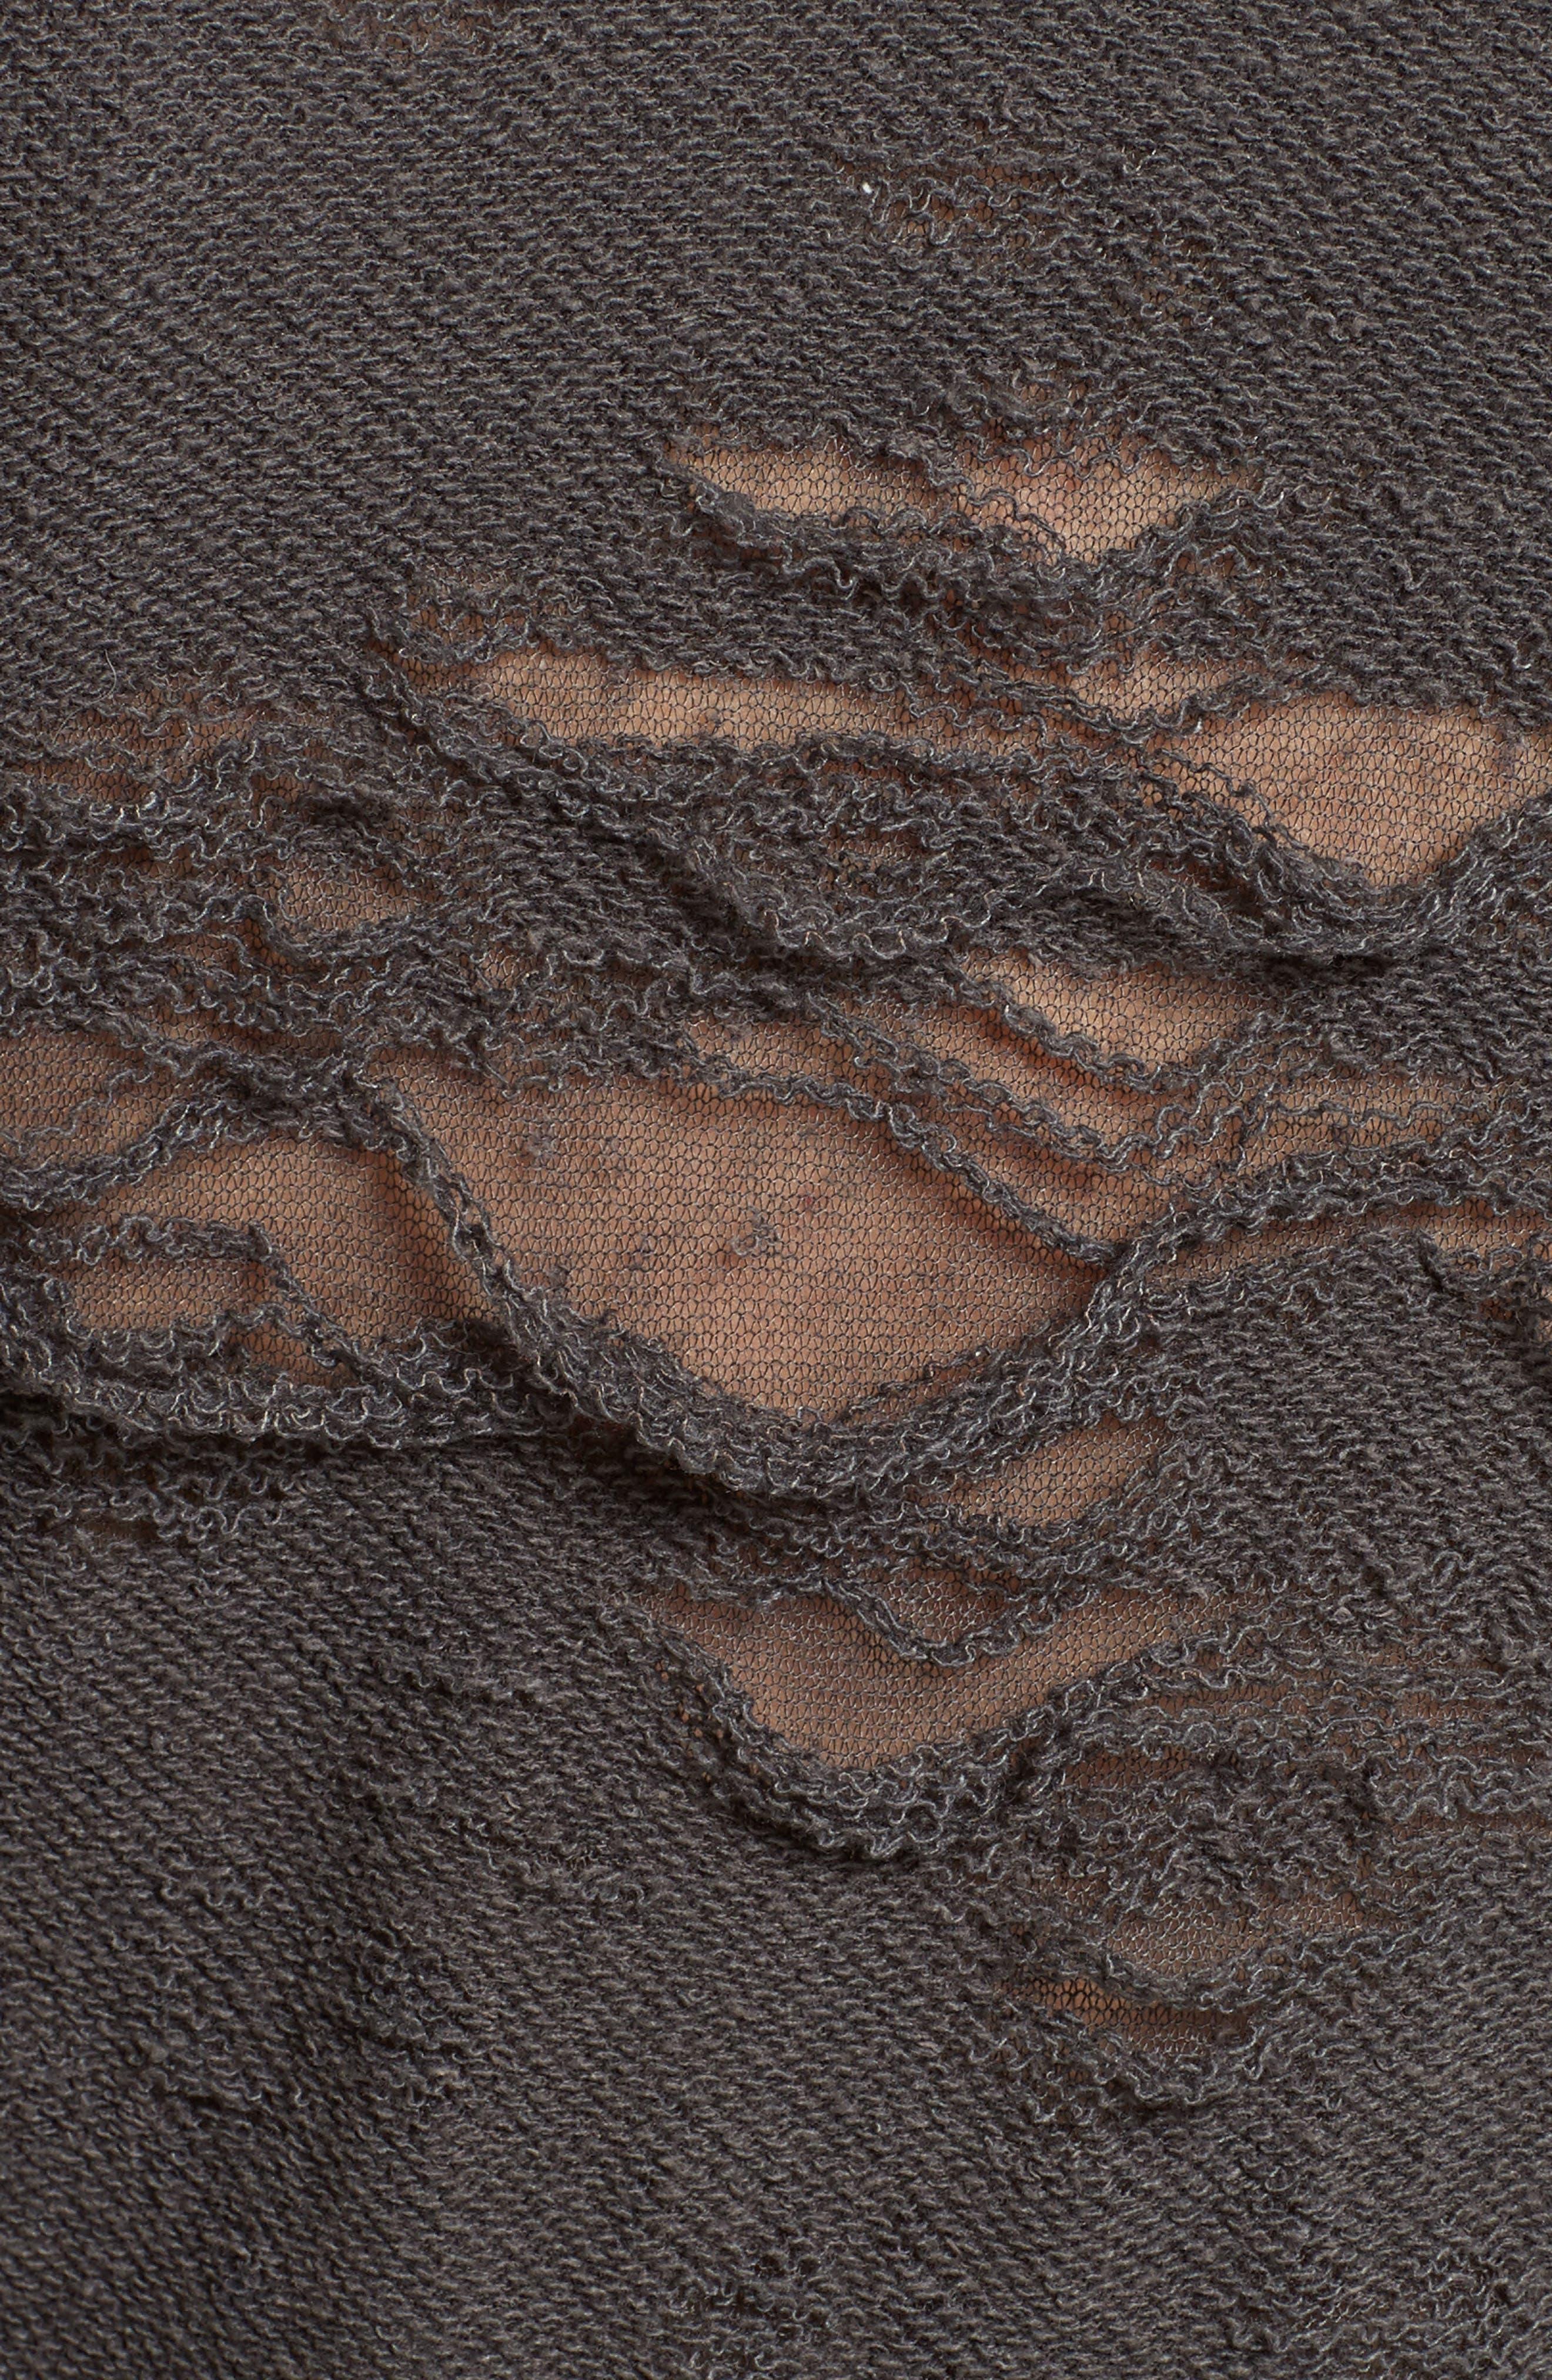 Cevoc Distressed Dress,                             Alternate thumbnail 5, color,                             029